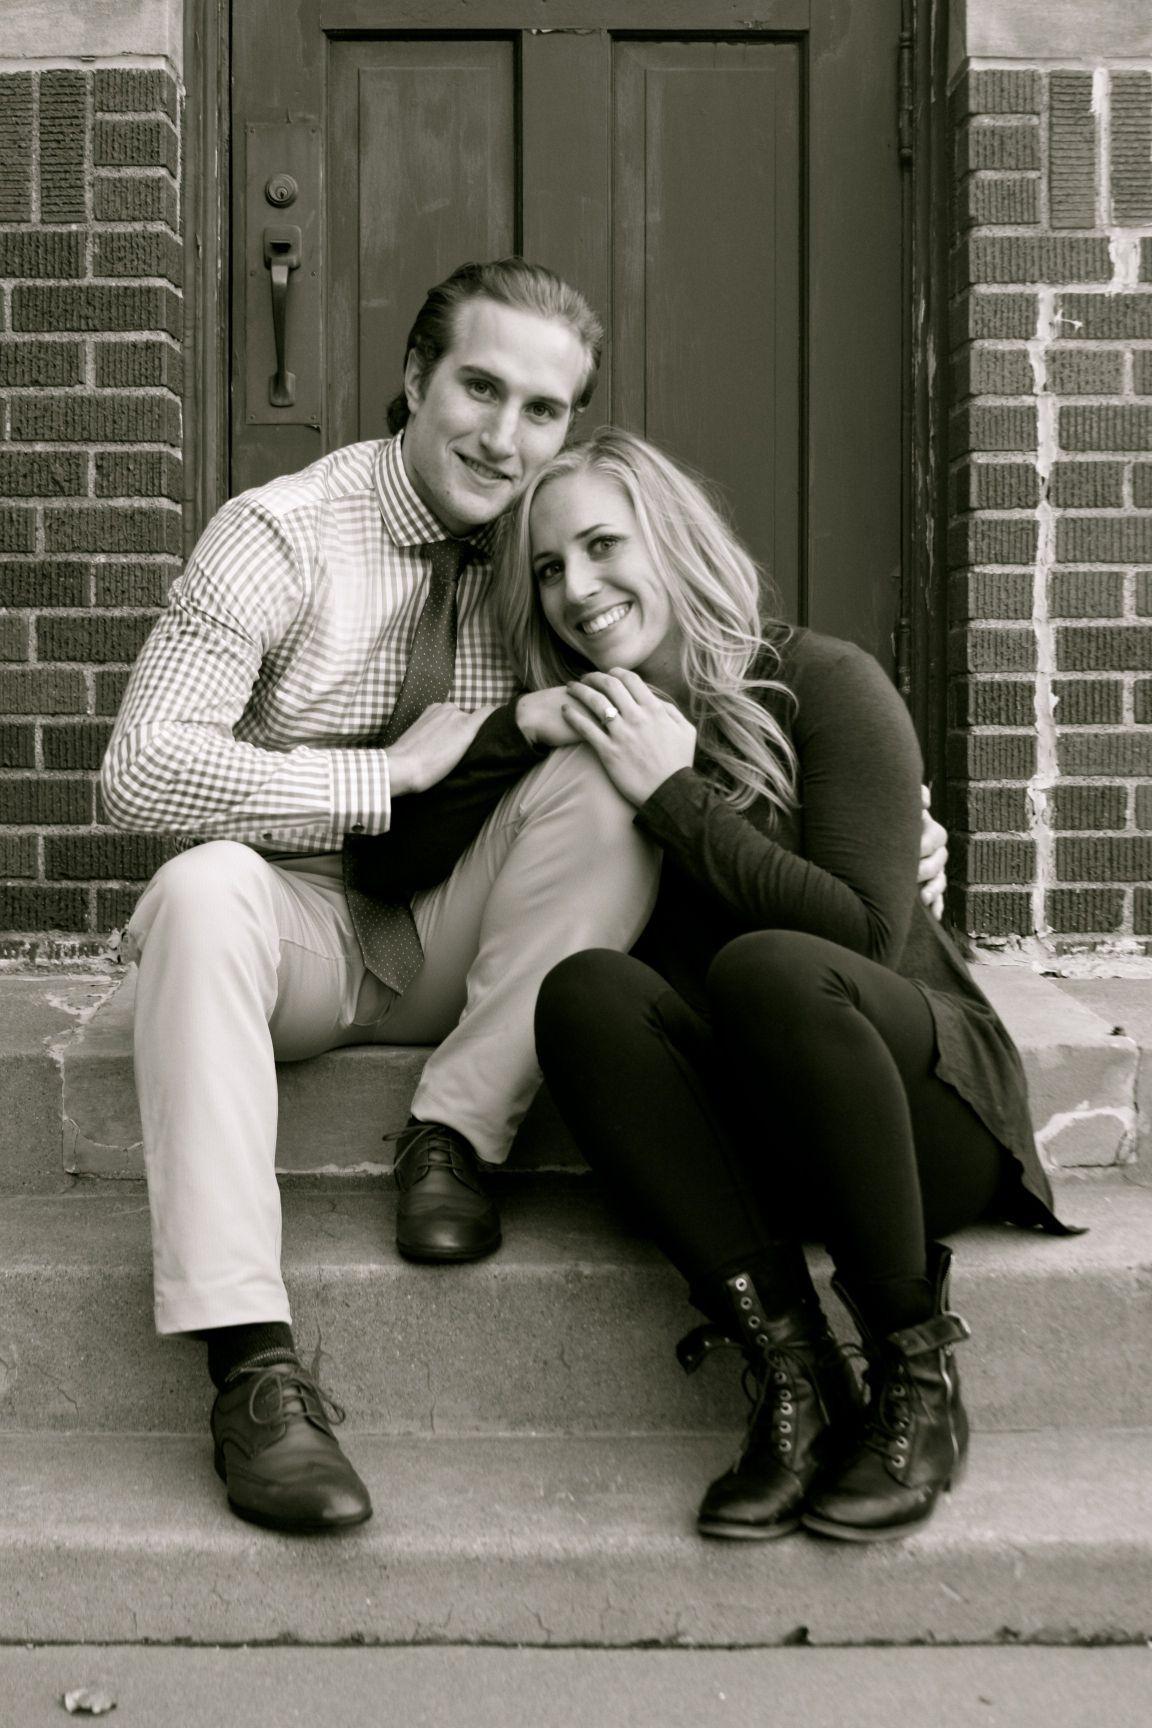 Molstead-Crevier | Engagements | wcfcourier.com